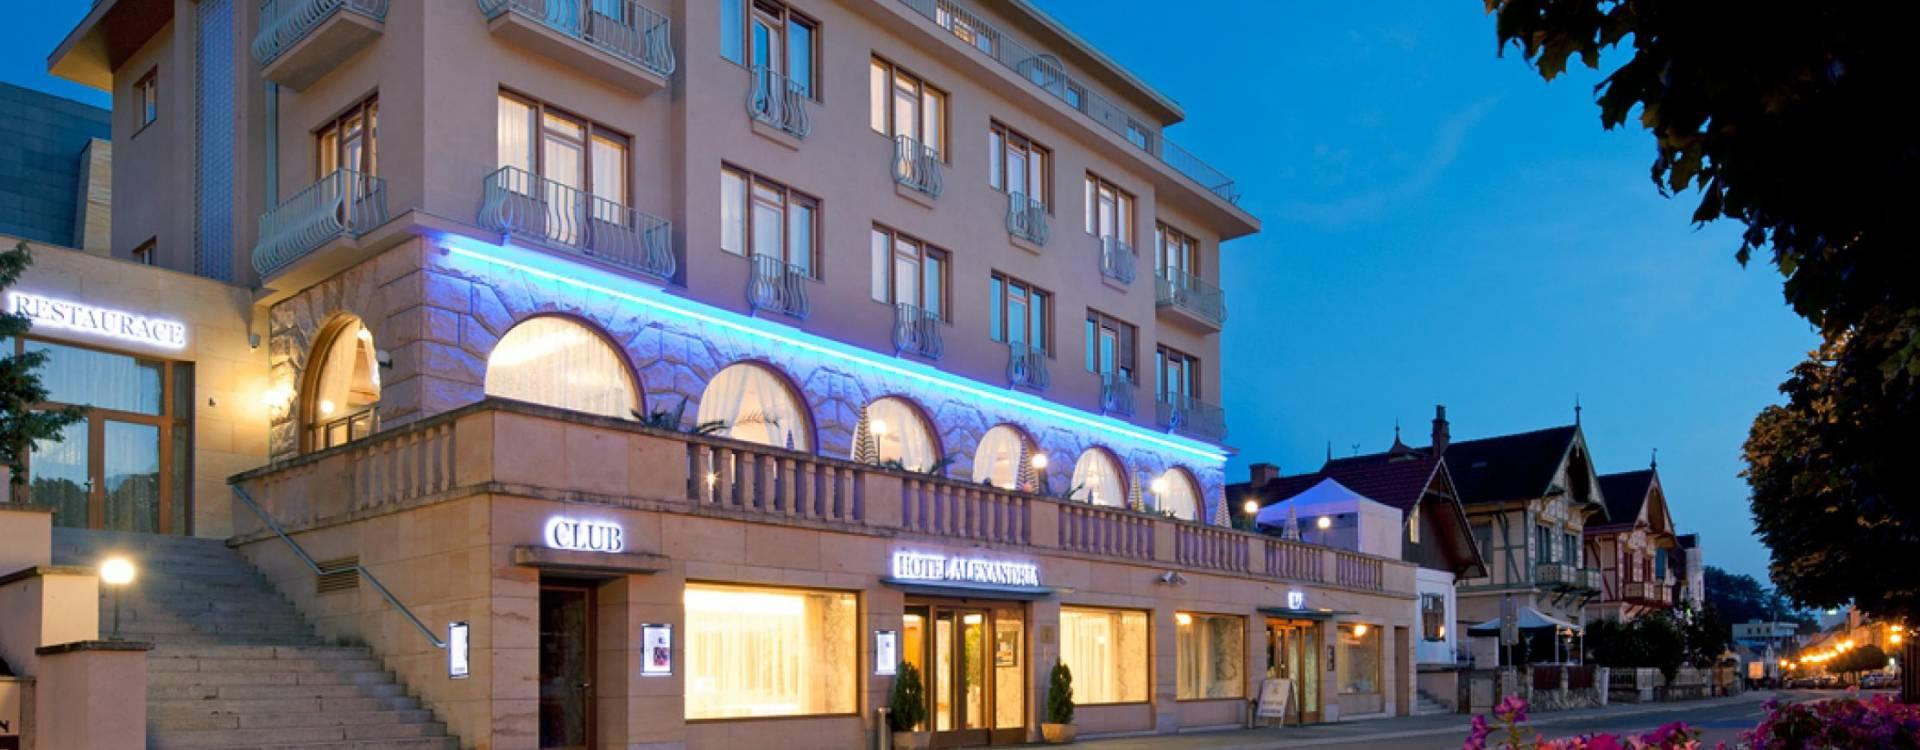 Spa a Wellness hotel Alexandria - Lázně Luhačovice | Lázně Travel